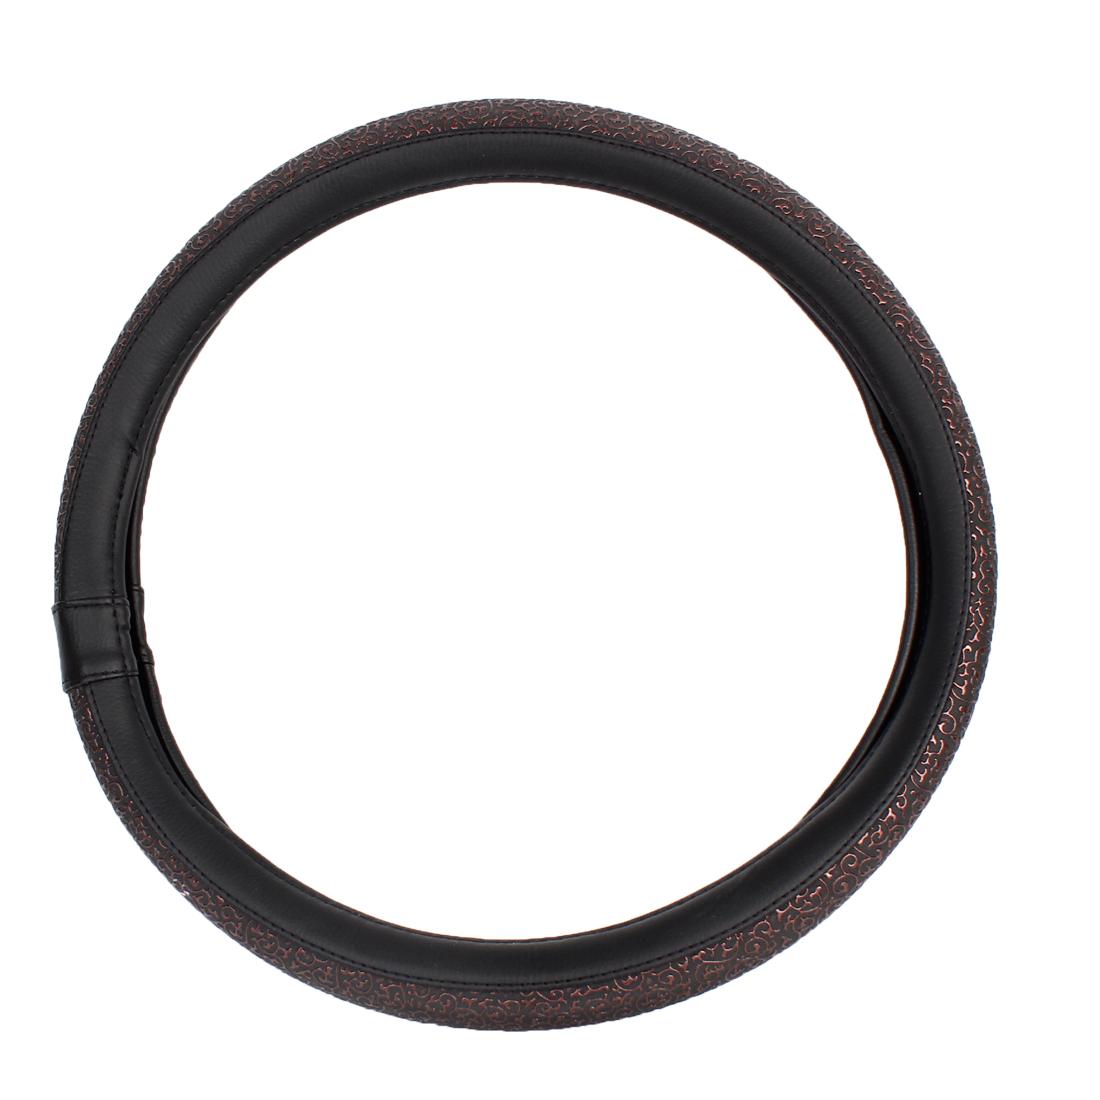 38cm Dia Brown Black Nonslip Faux Leathr Steering Wheel Cover Protector for Car